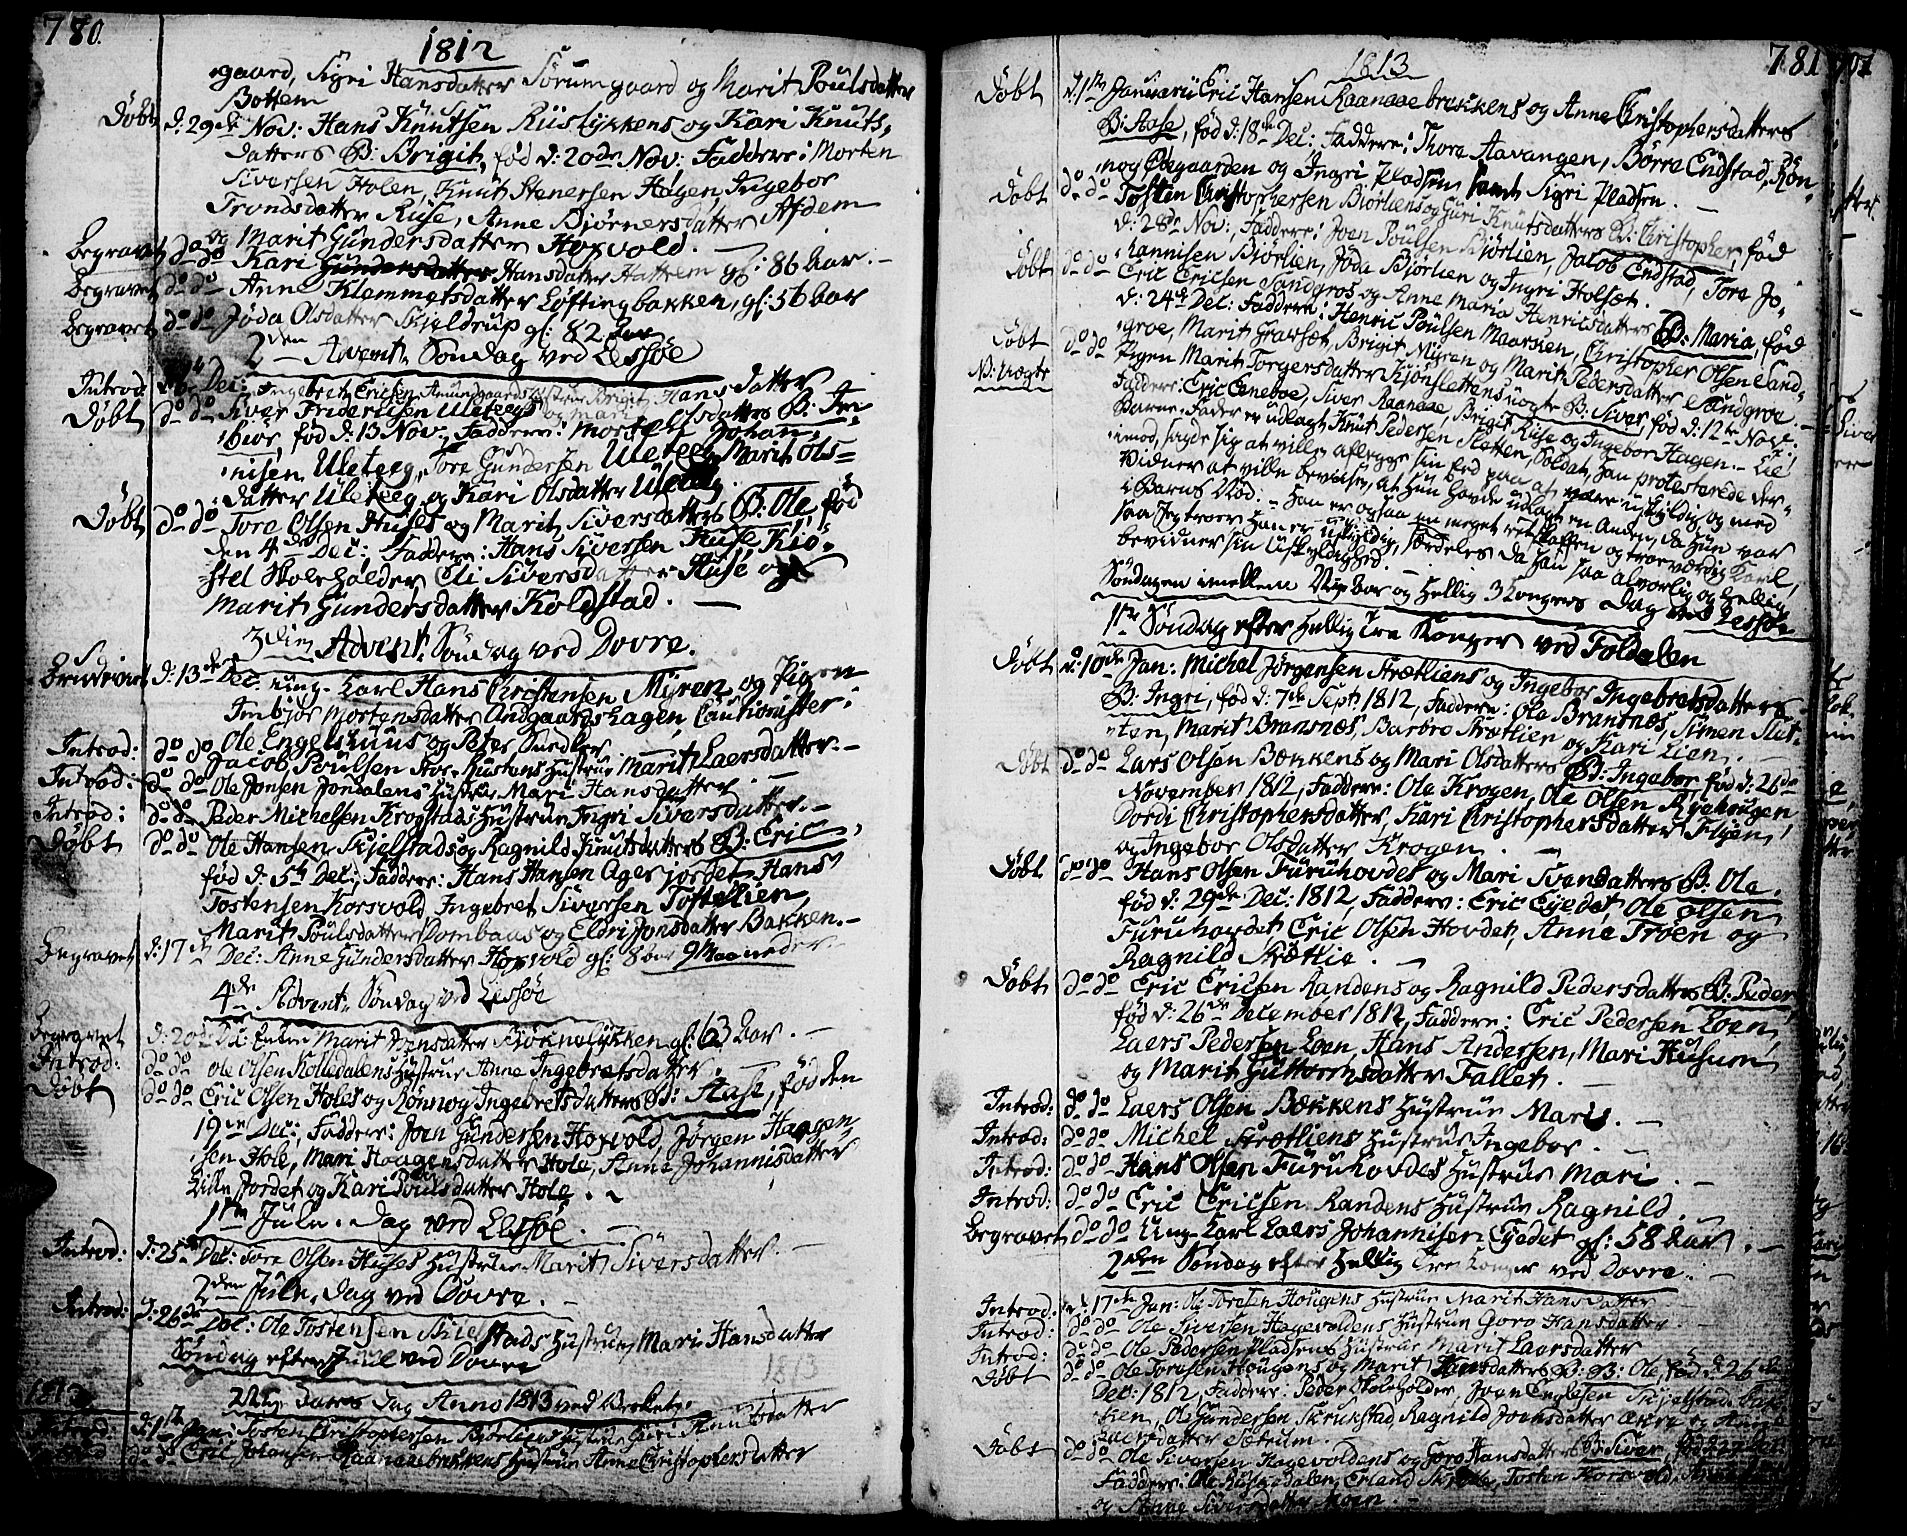 SAH, Lesja prestekontor, Ministerialbok nr. 3, 1777-1819, s. 780-781